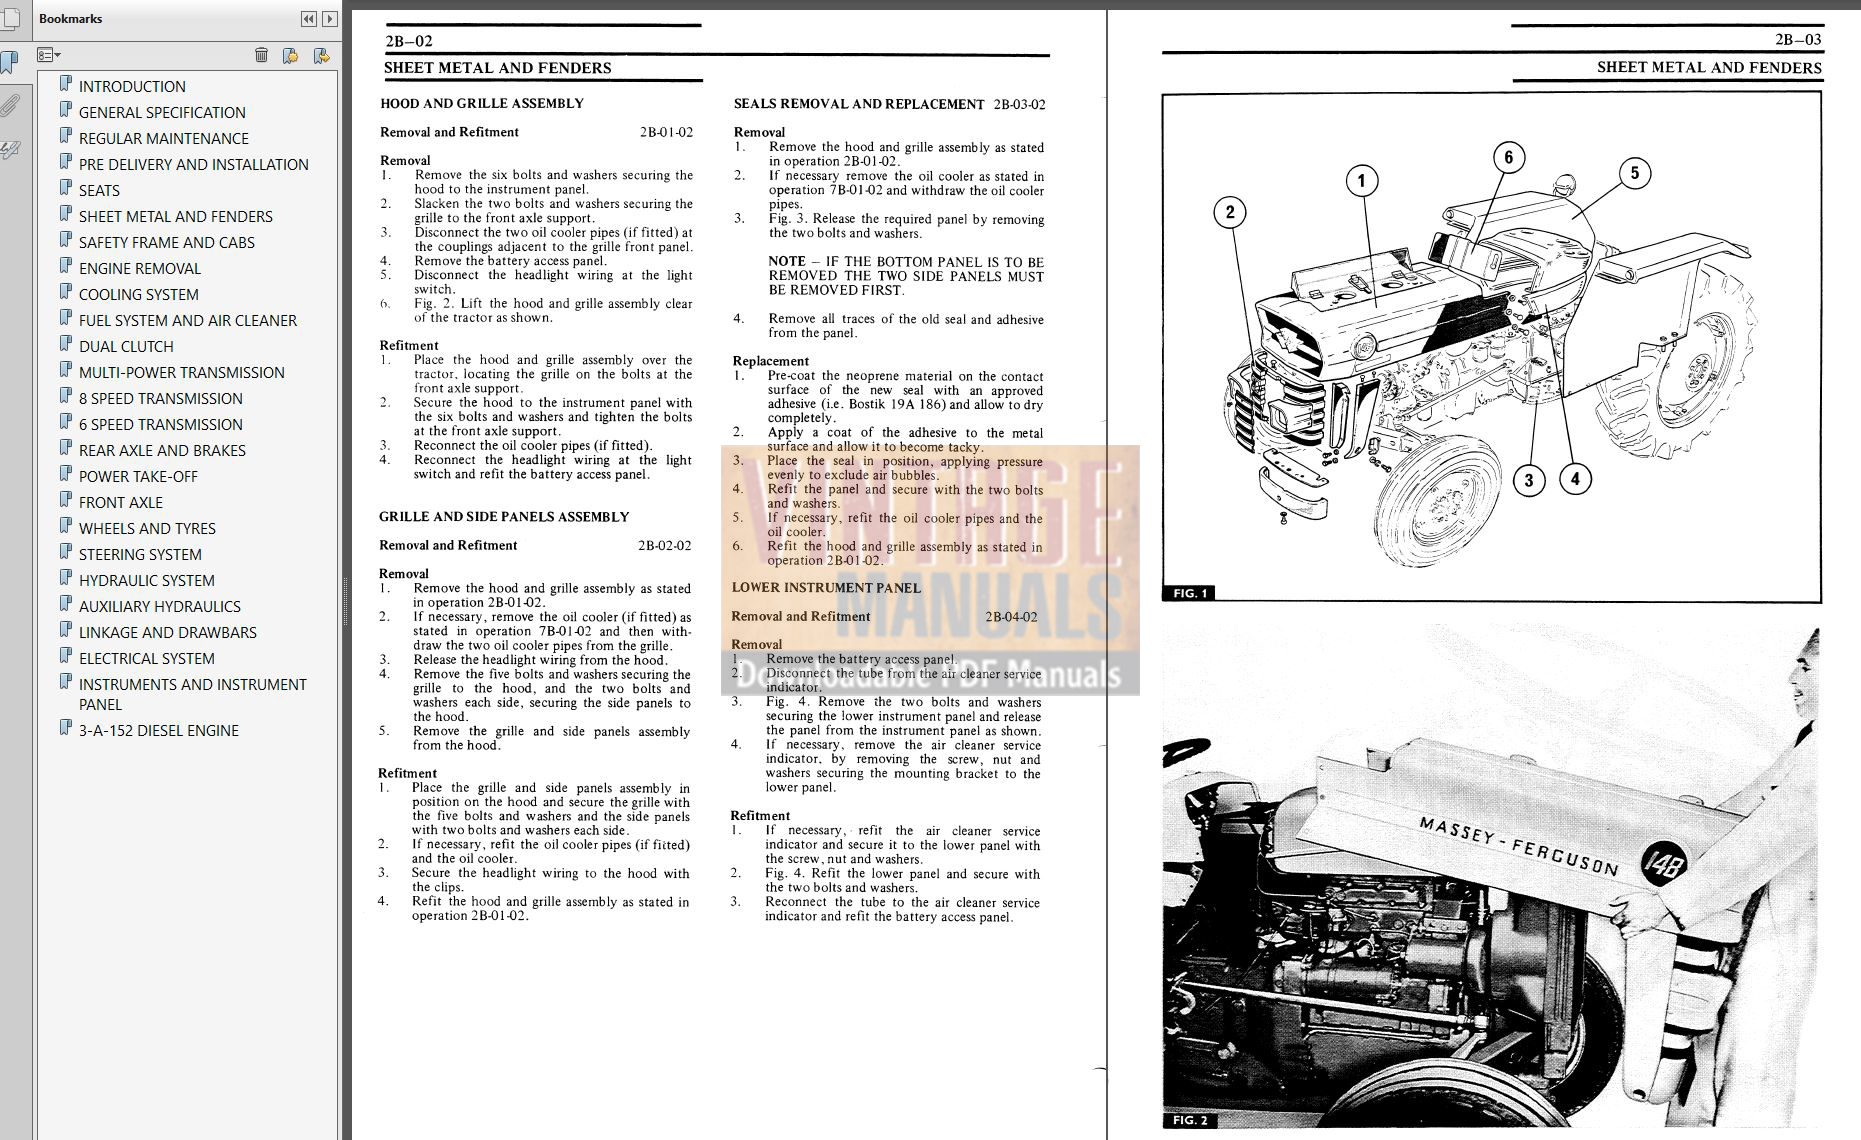 Massey Ferguson Mf 135 148 Tractor Service Manual